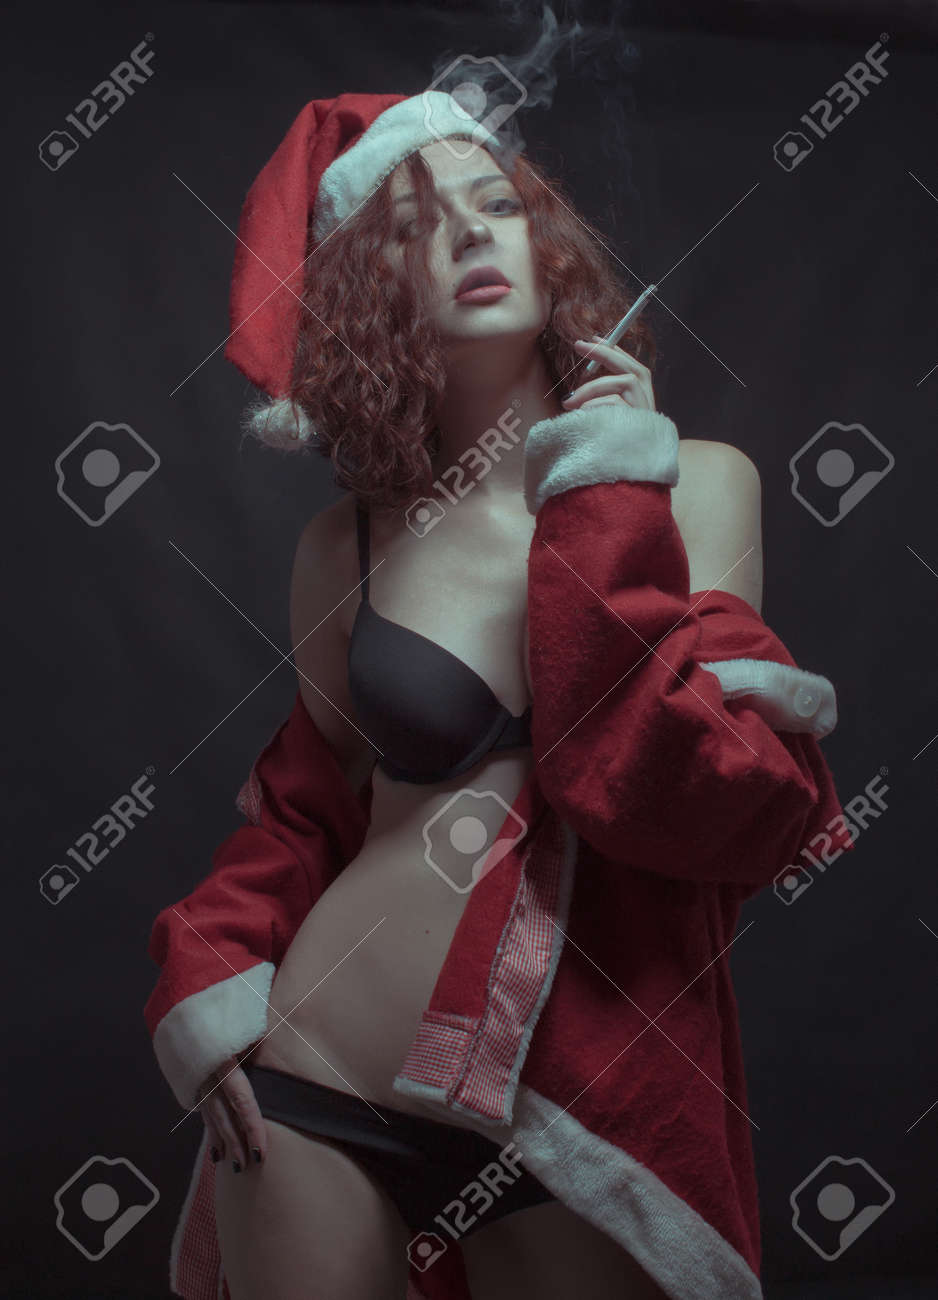 Seductive girl in Santa's costume smoking over dark background - 120790704